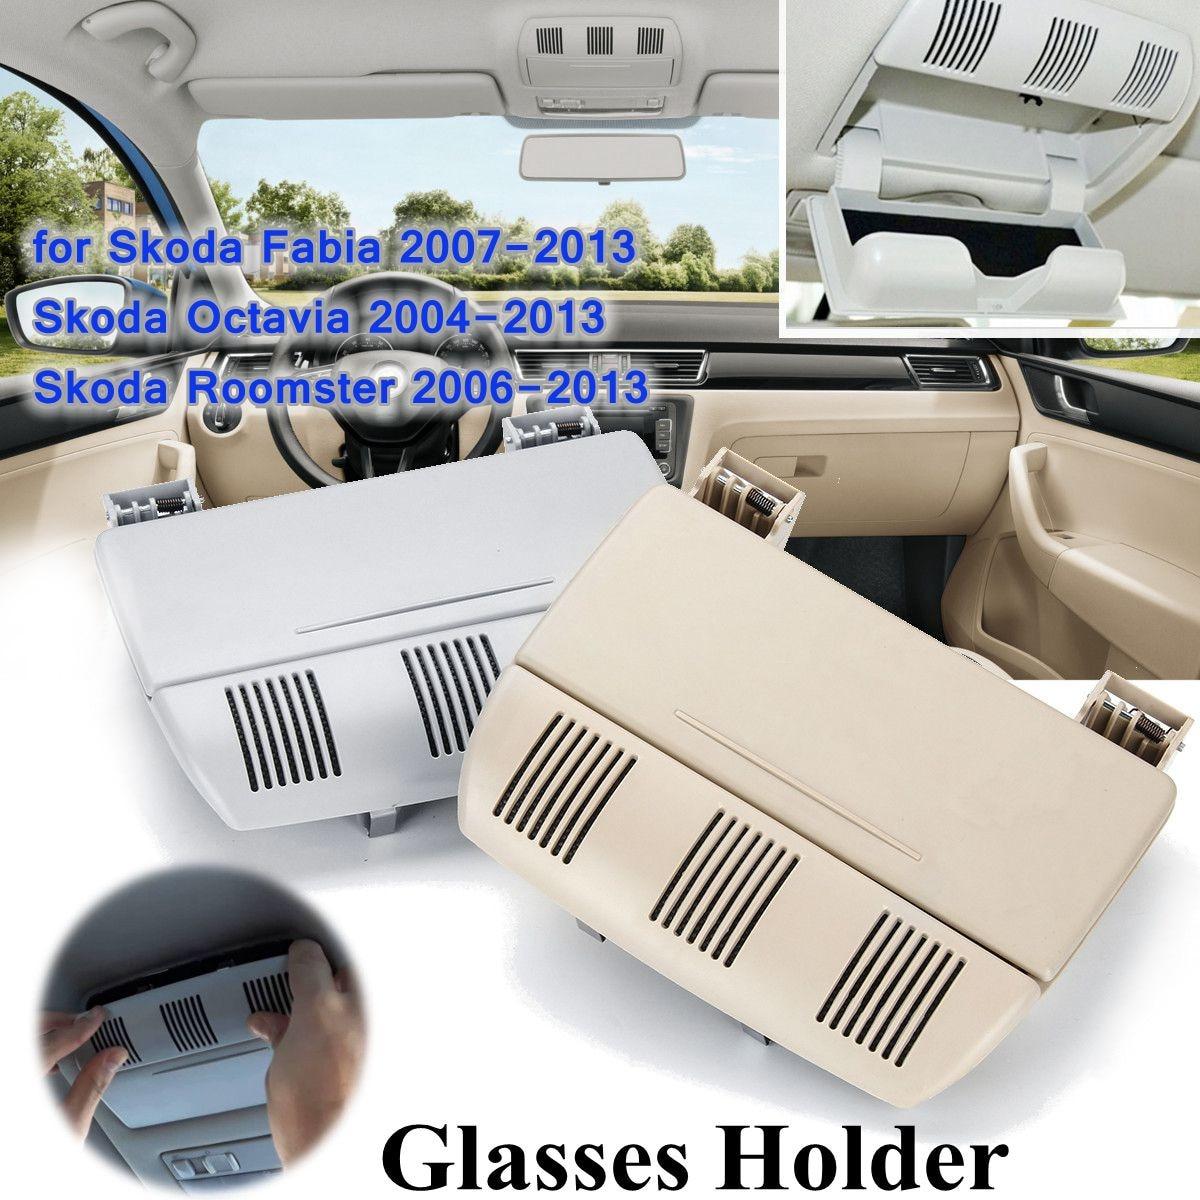 Car Sunglasses Holder Glasses Holder Case Storage Box for Skoda Fabia Octavia Roomster 1Z0 868 565 1Z0868565E 2004-2013 эмблема для авто vw original oem vw skoda skoda fabia octavia roomster